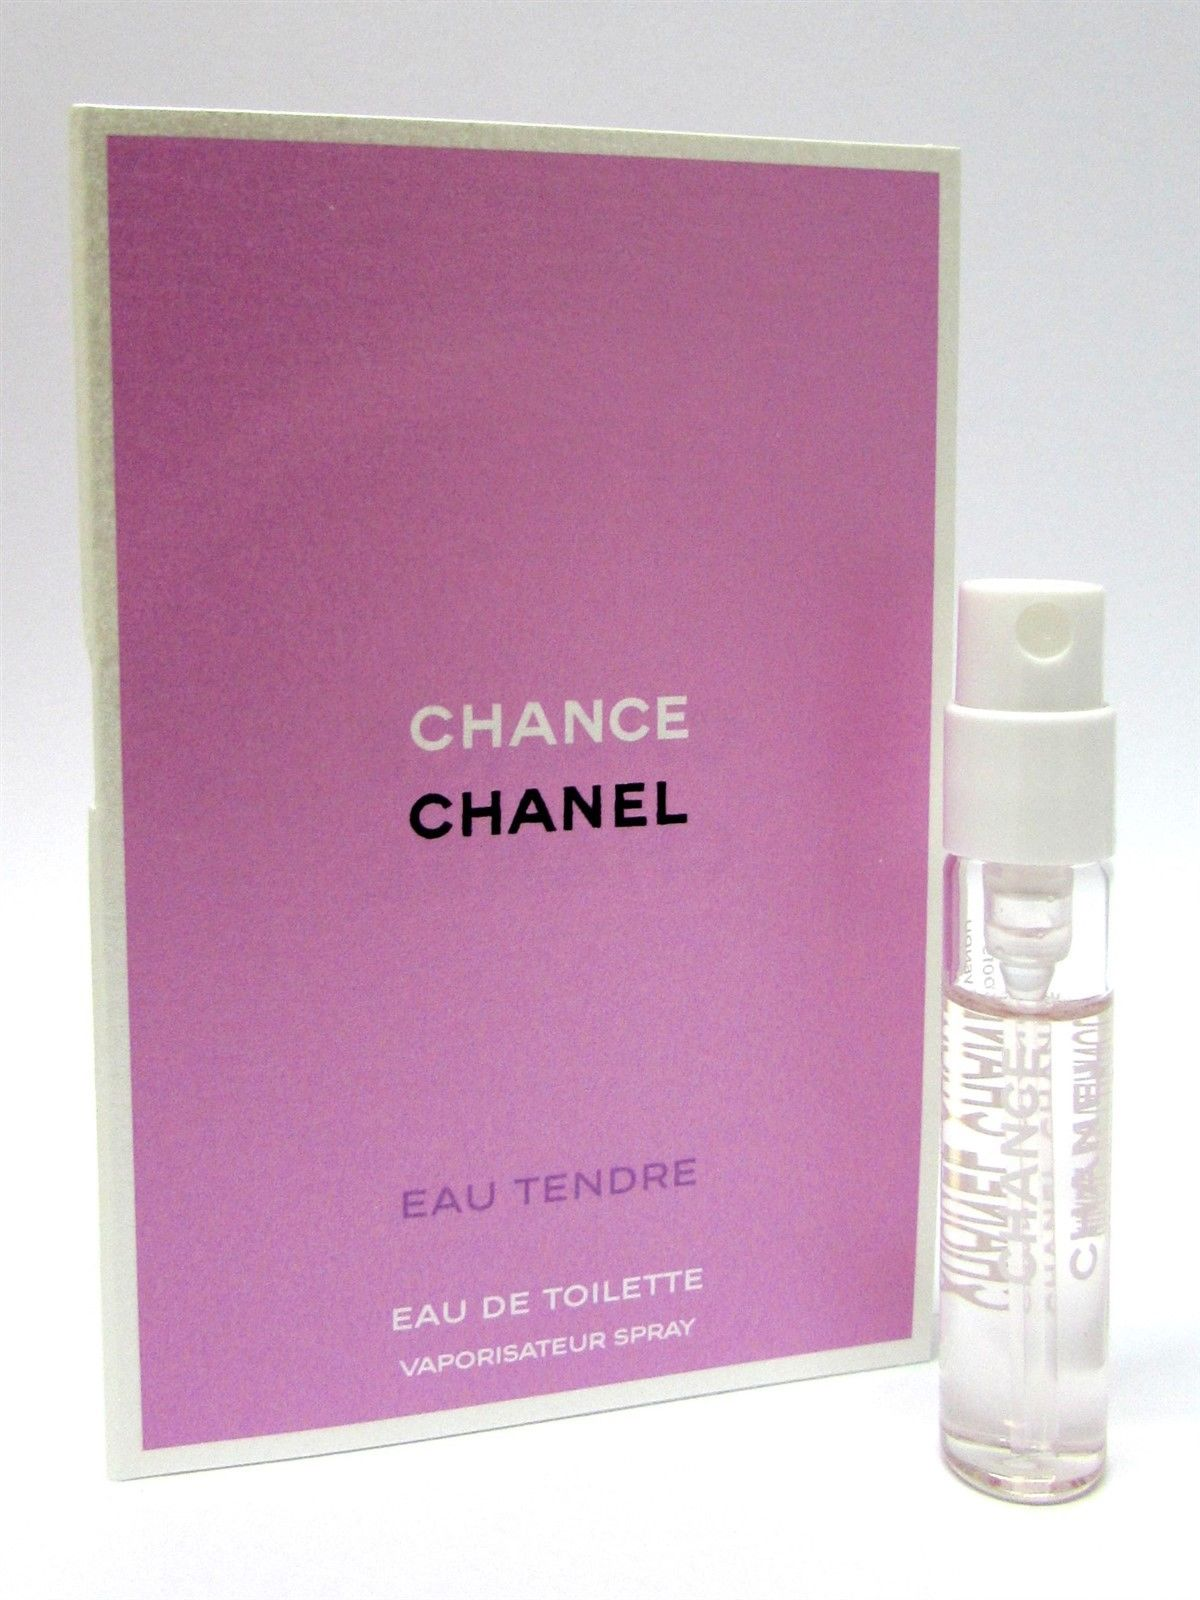 Chanel Chance Eau De Toilette toaletní voda 2ml vzorek W